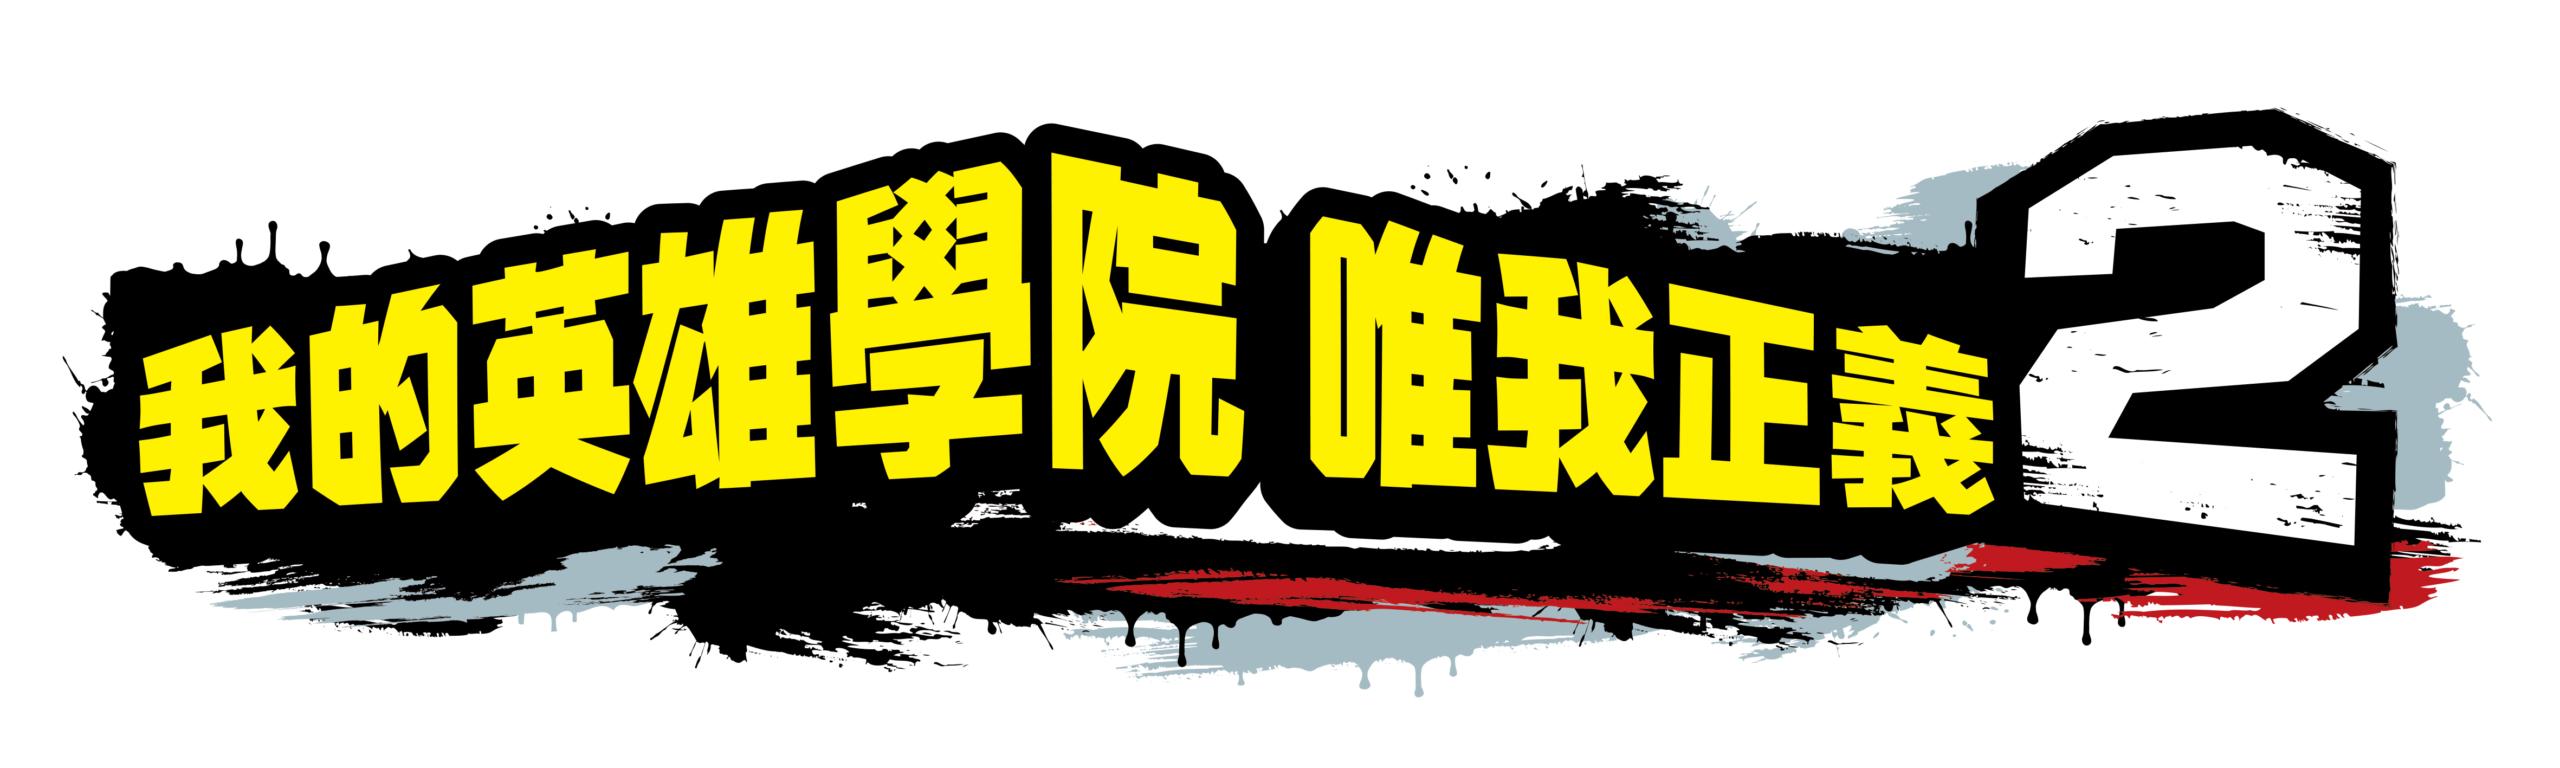 Topics tagged under 遊戲情報 on 紀由屋分享坊 Mhaoj210